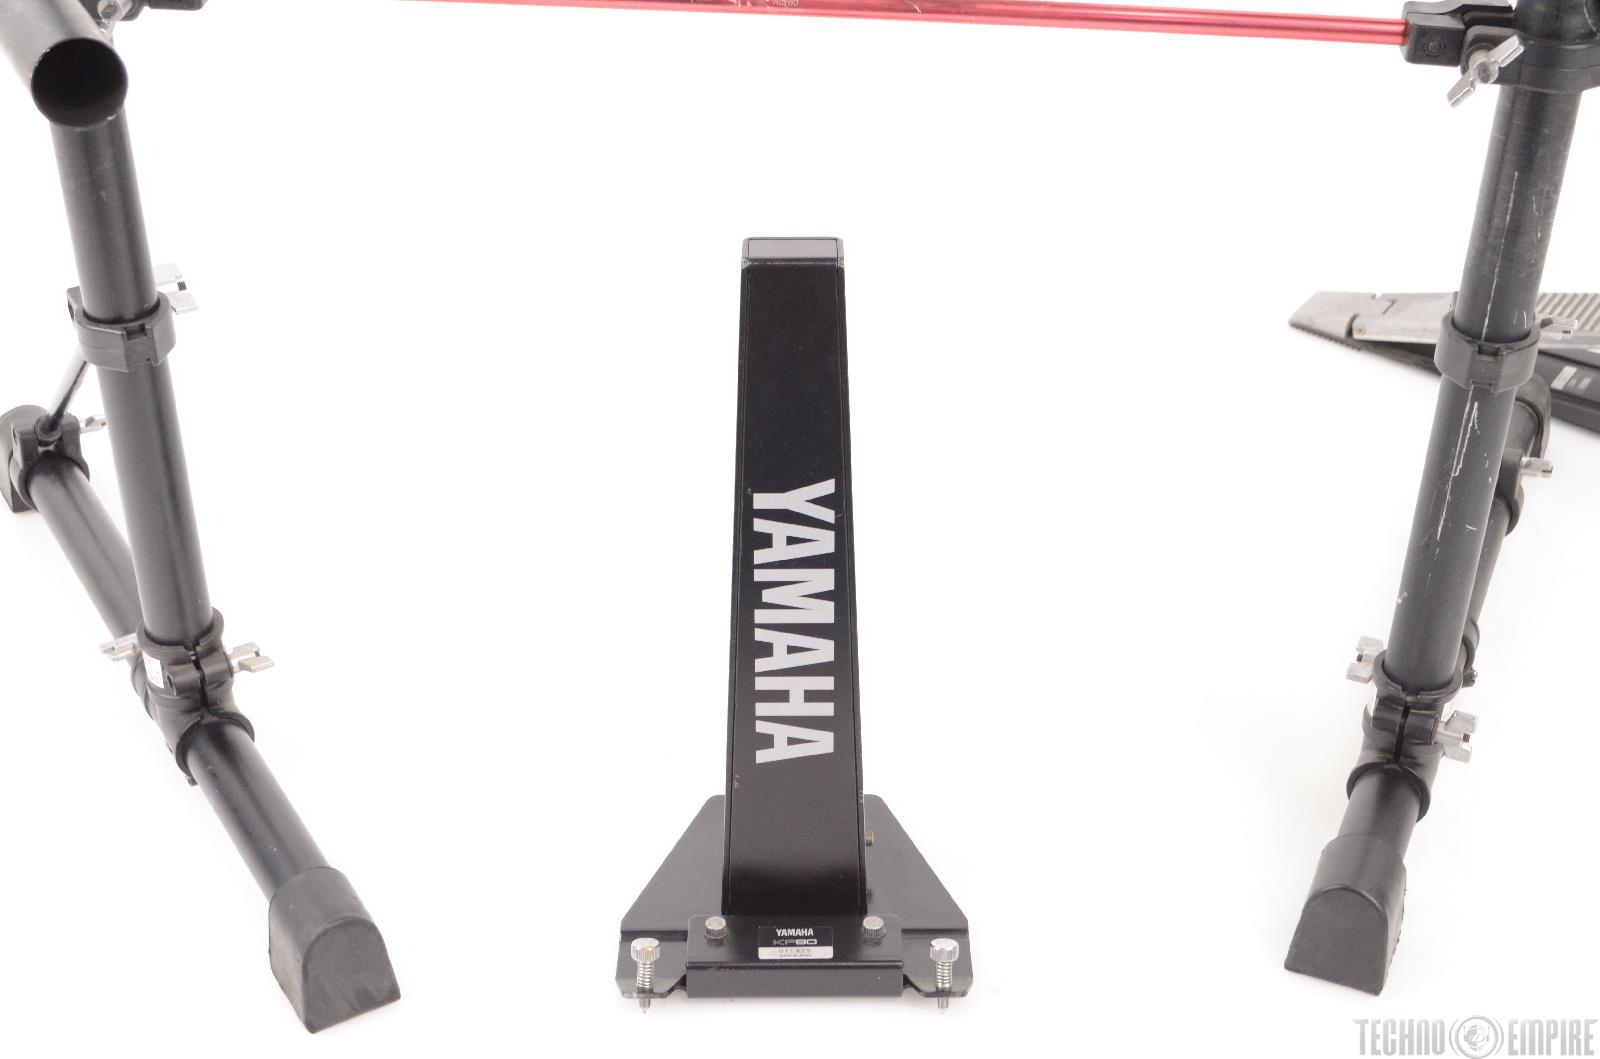 Yamaha Pcy Ebay